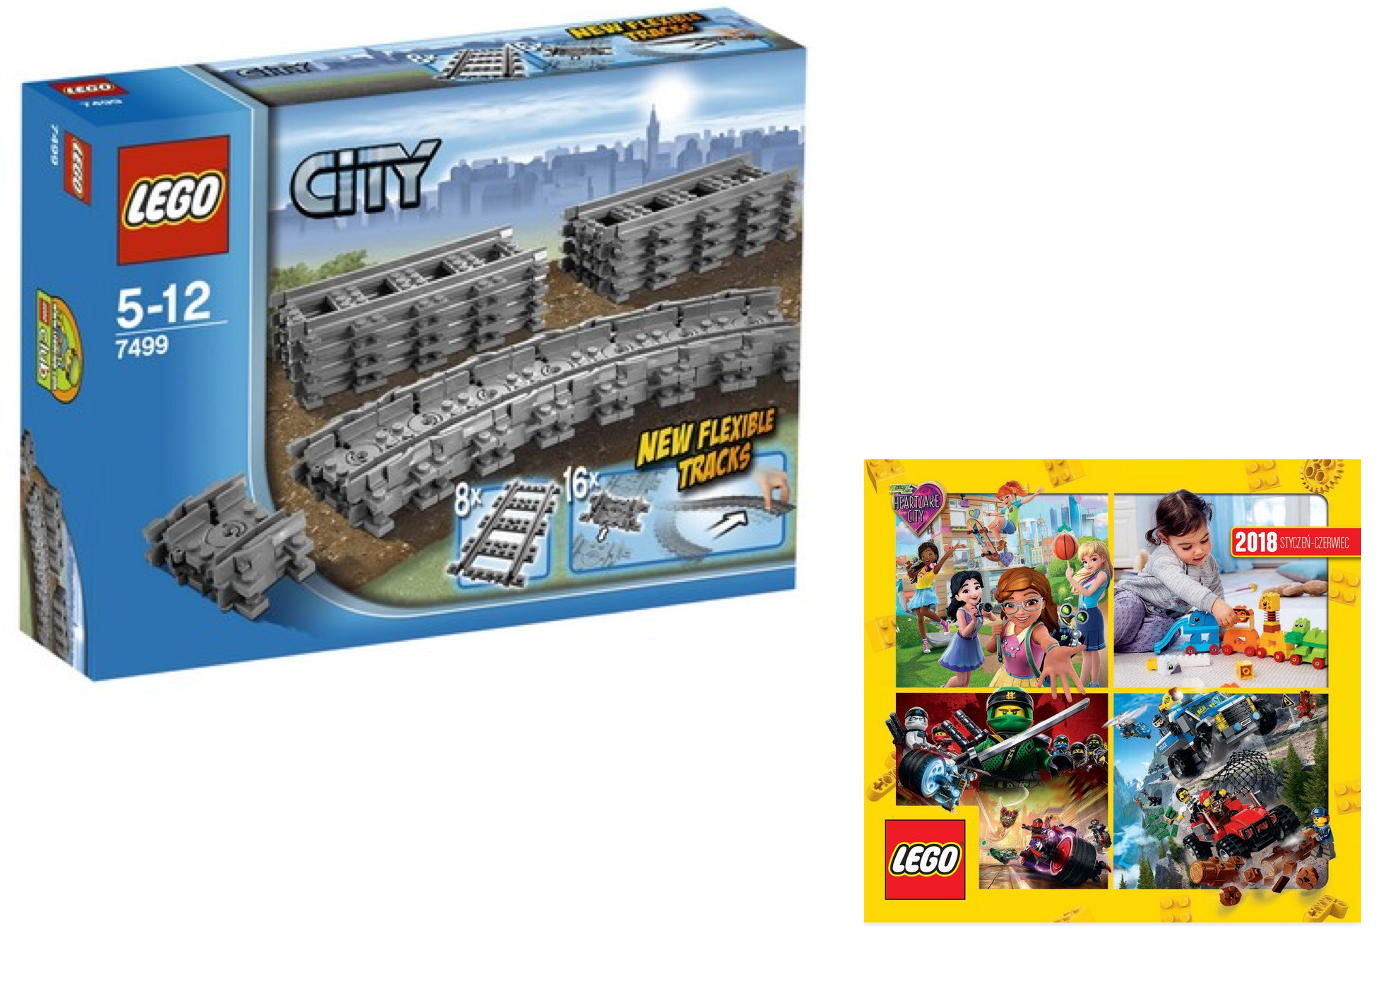 Lego City 7499 Elastyczne Tory Katalog 2018 7158105011